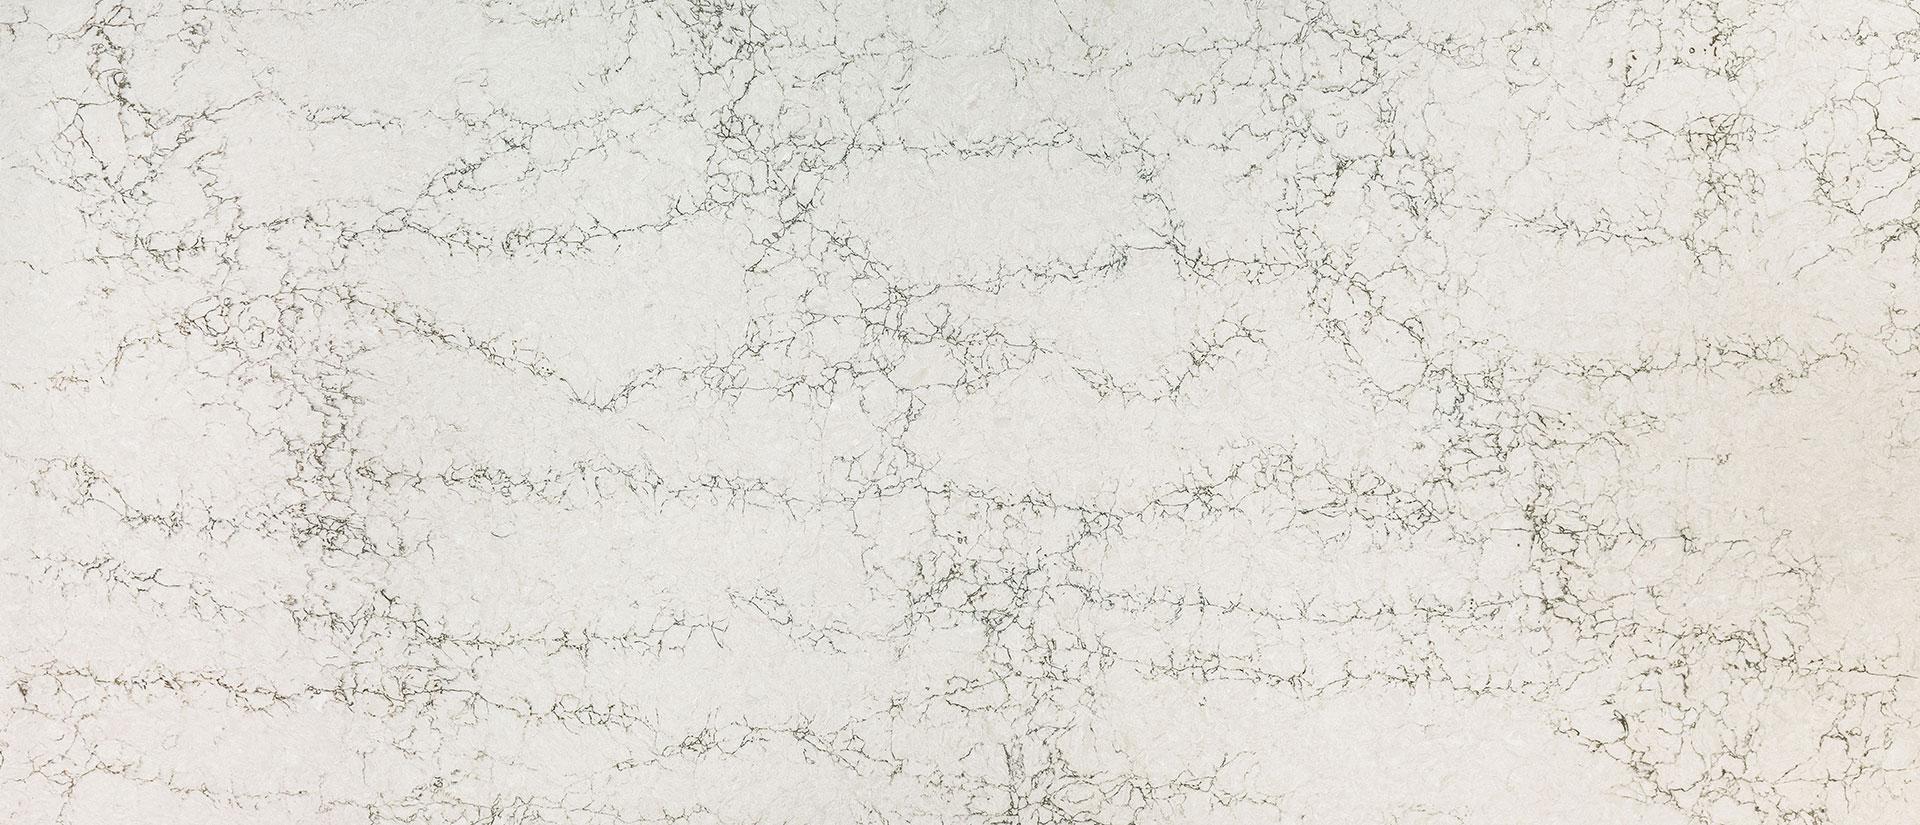 Lido Blanco Quartz Slab Countertops Q Premium NATURAL Quartz